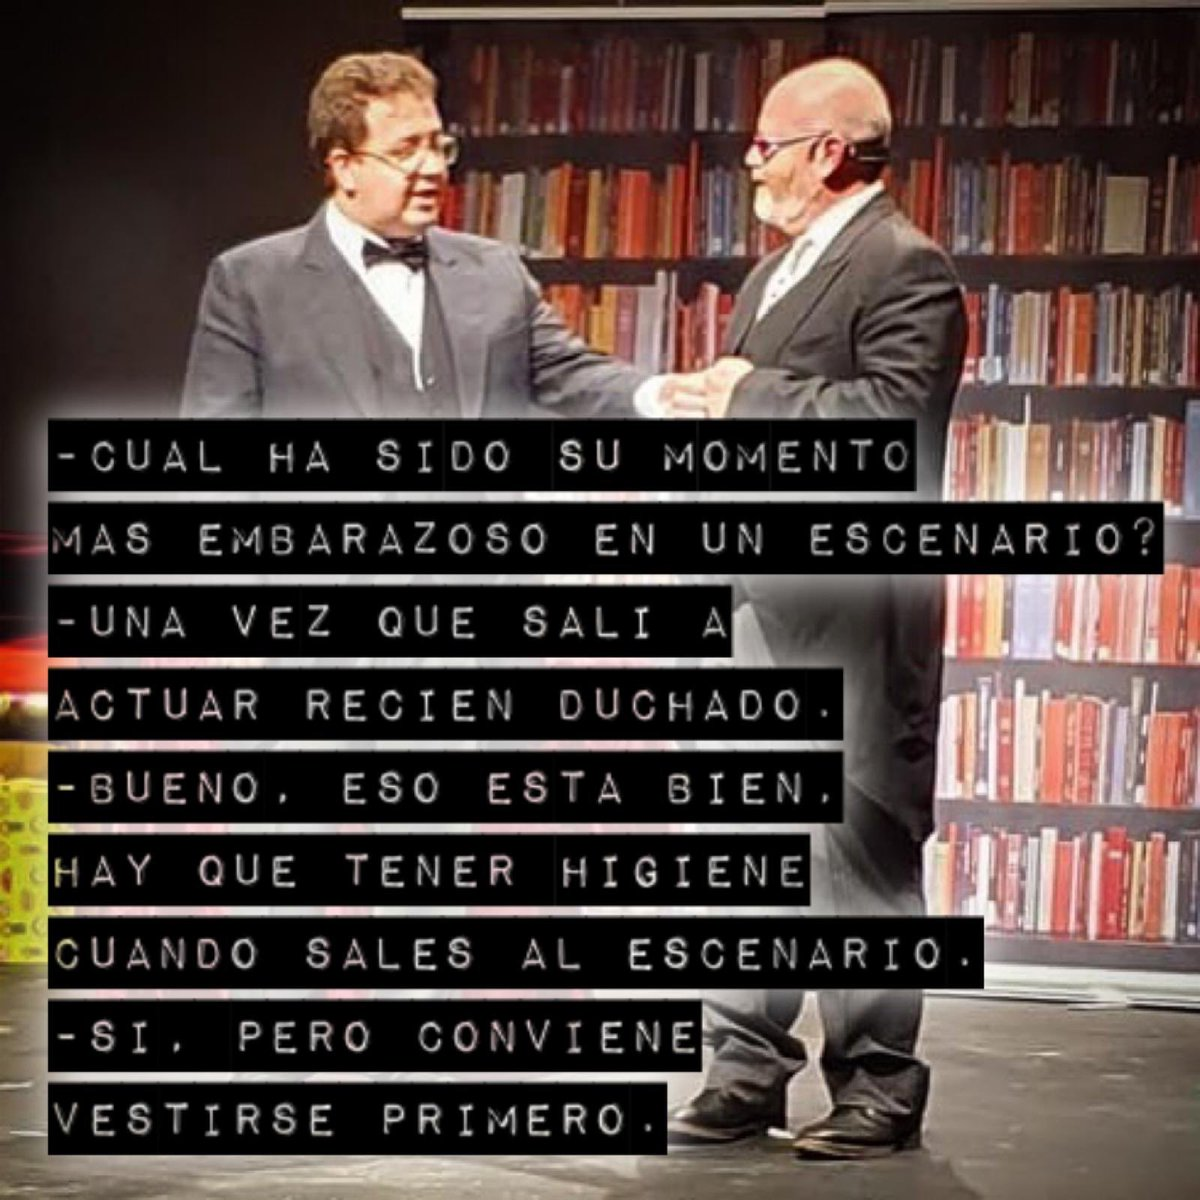 Cosas de Abra y Cadabra. #magia #humor #comedia #risas #teatro #mago #magos #abraycadabra #abraycadabraproduccionespic.twitter.com/nn7rdEtKJ2